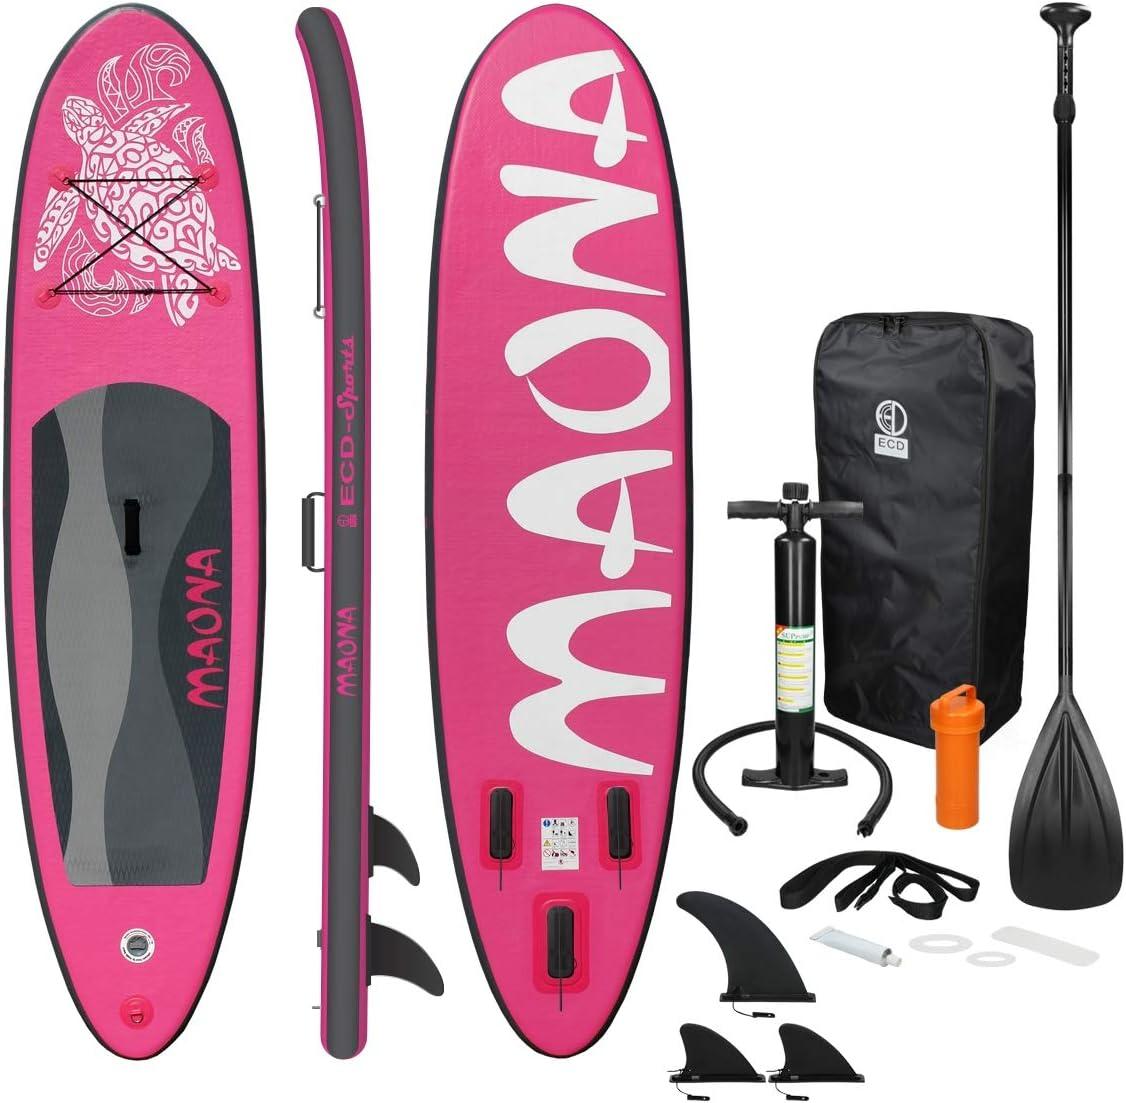 ECD Germany Tabla Hinchable Maona Paddle Surf/Sup 308 x 76 x 10 cm Rosa Stand up Paddle Board PVC hasta 120kg 3 Aletas deslizantes Diferentes Modelos Incl Paleta Aluminio Bomba y Accesorios